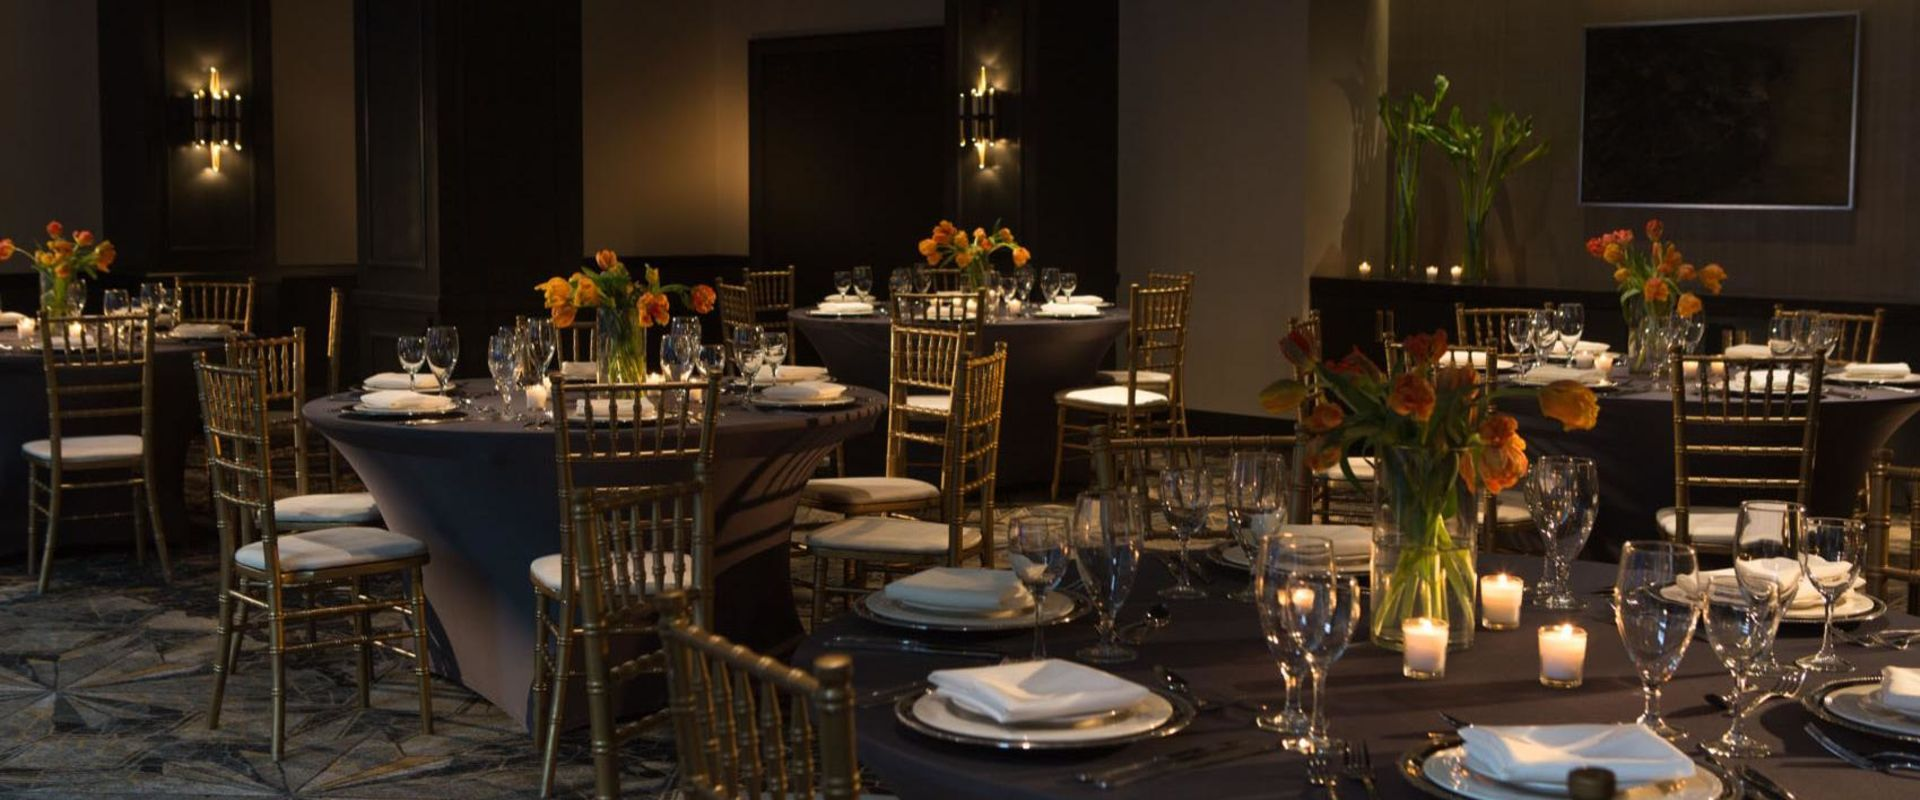 Chicago Loop Banquet Hall Wedding Setting